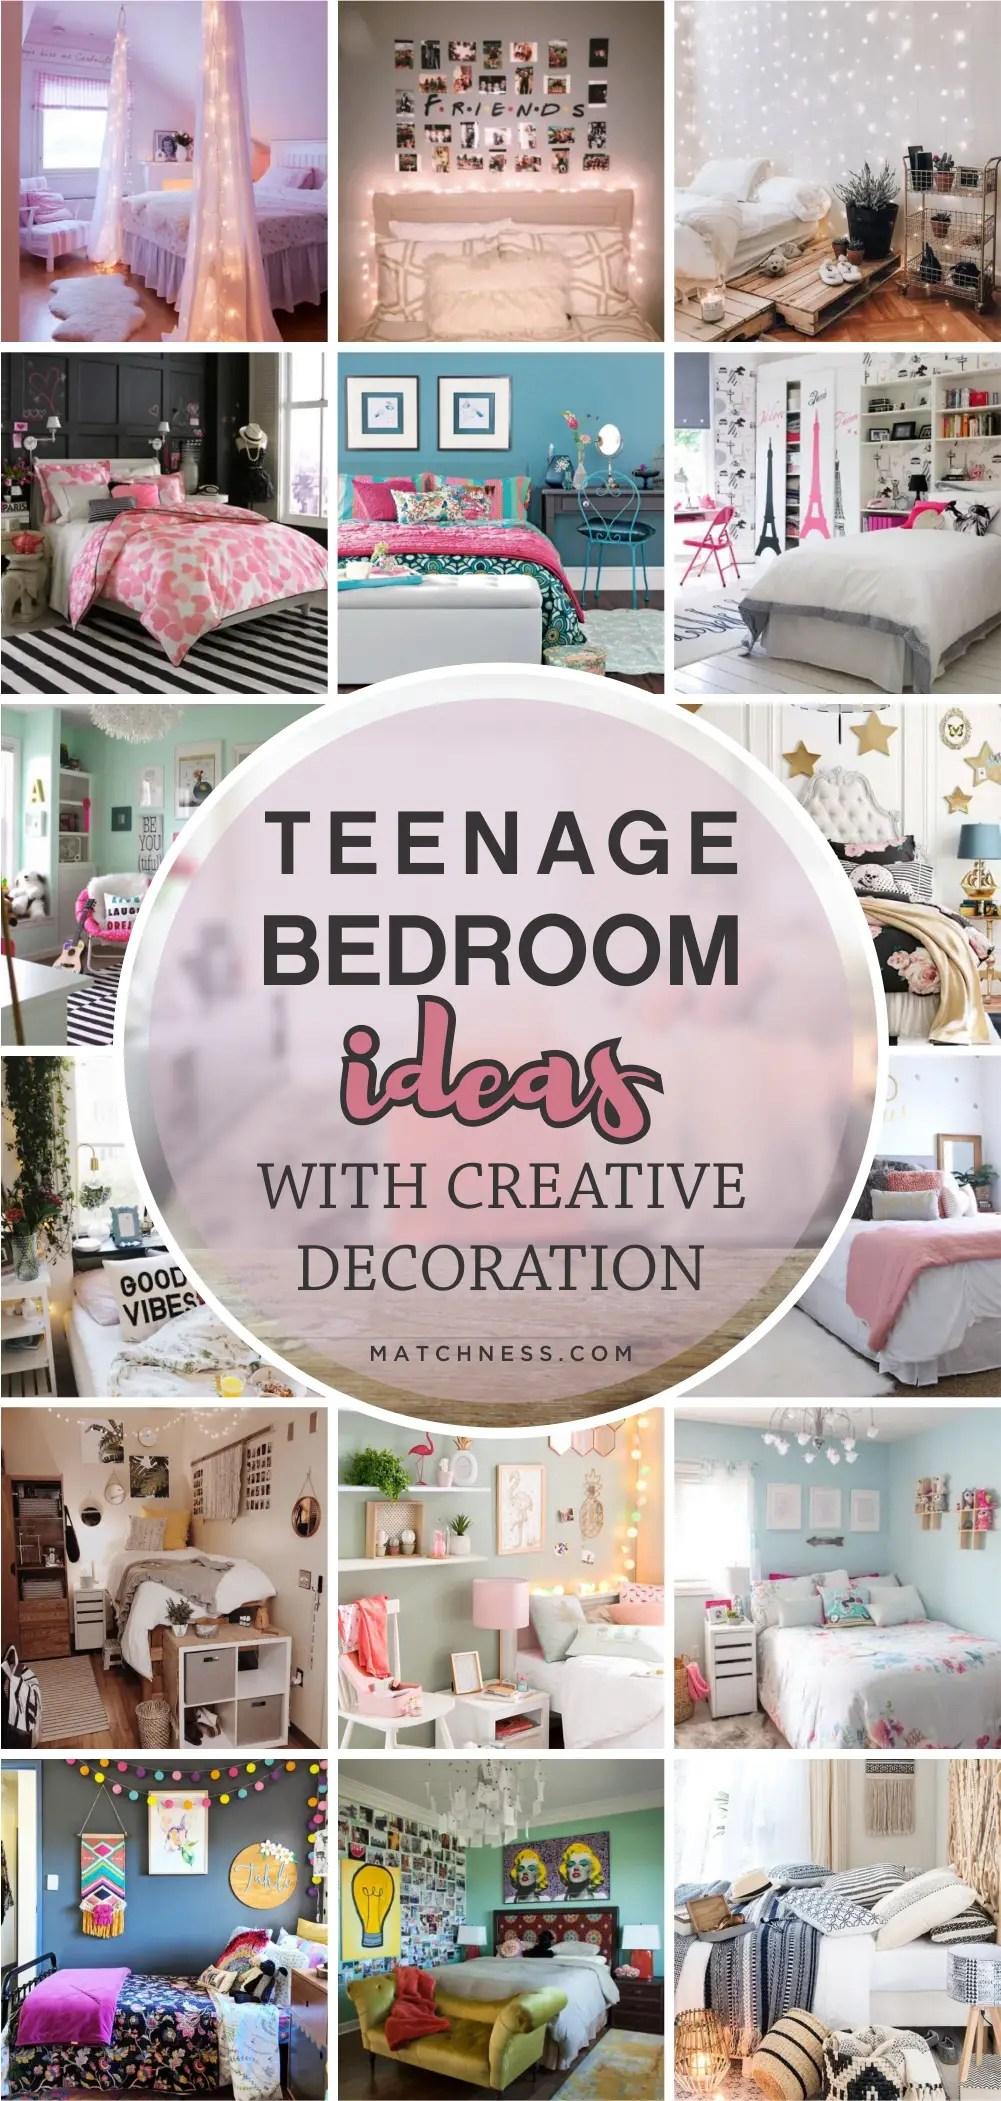 Teenage-bedroom-ideas-with-creative-decoration-1